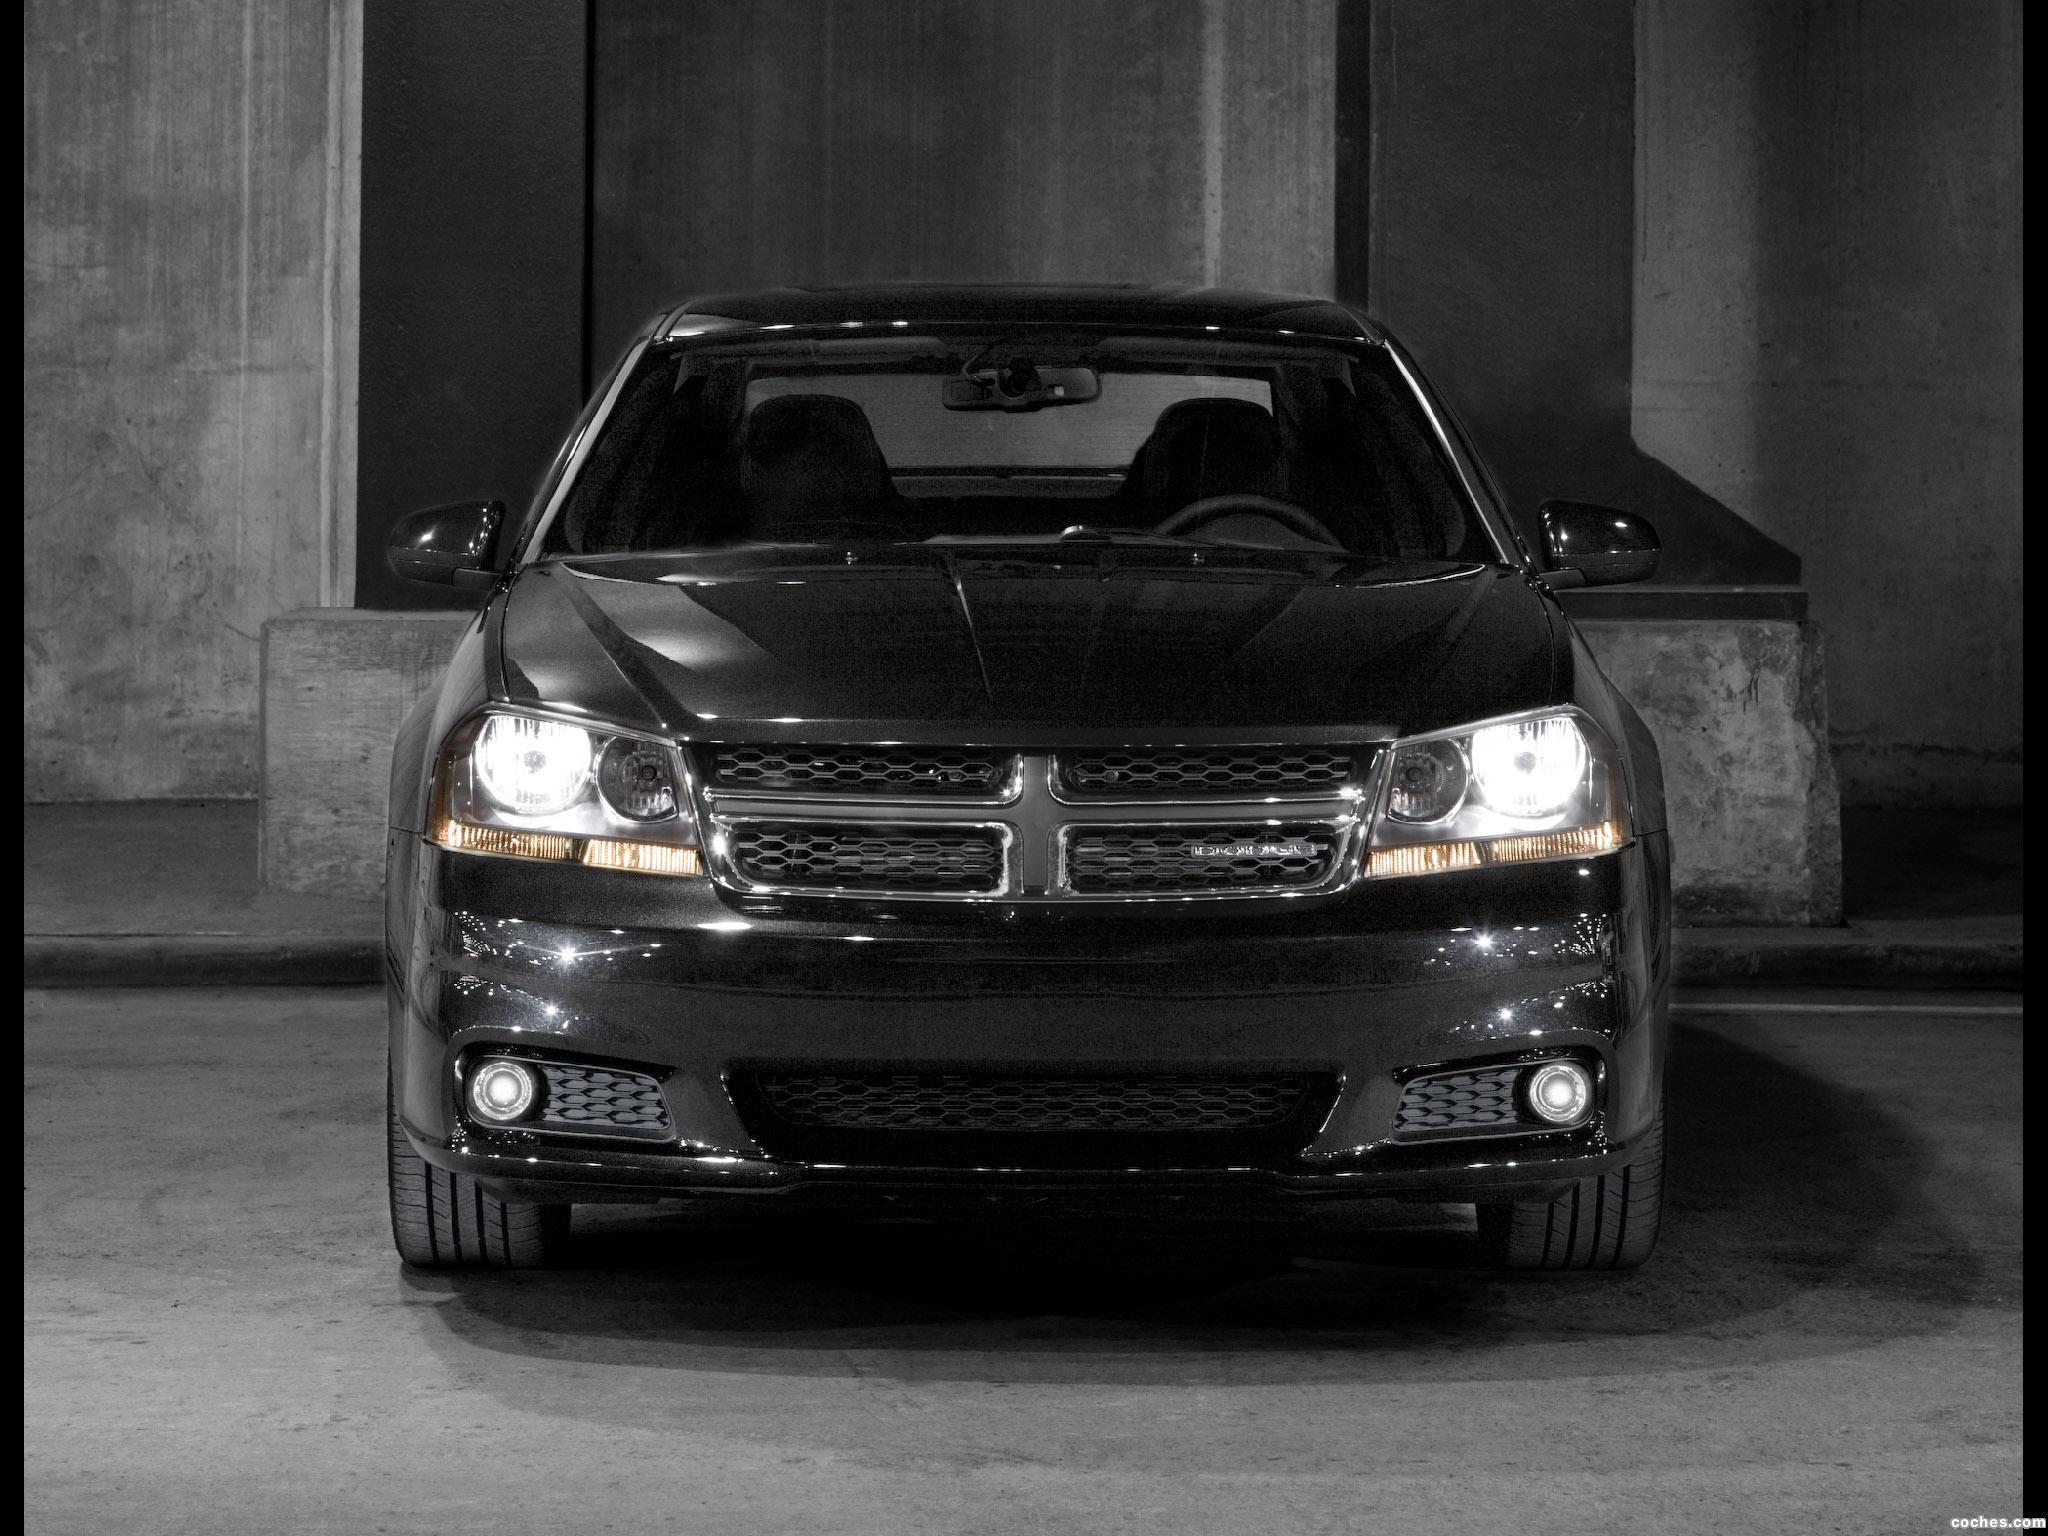 Foto 2 de Dodge Avenger 2010